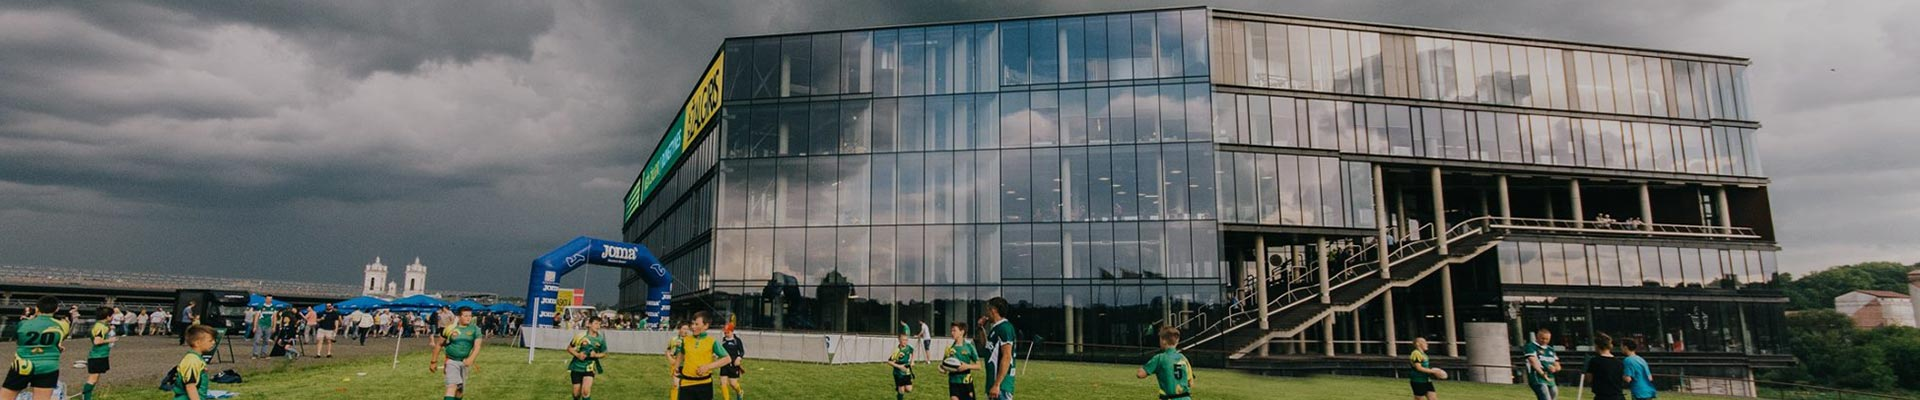 Zalgiris-Arena-Kaunas-event-outdoor